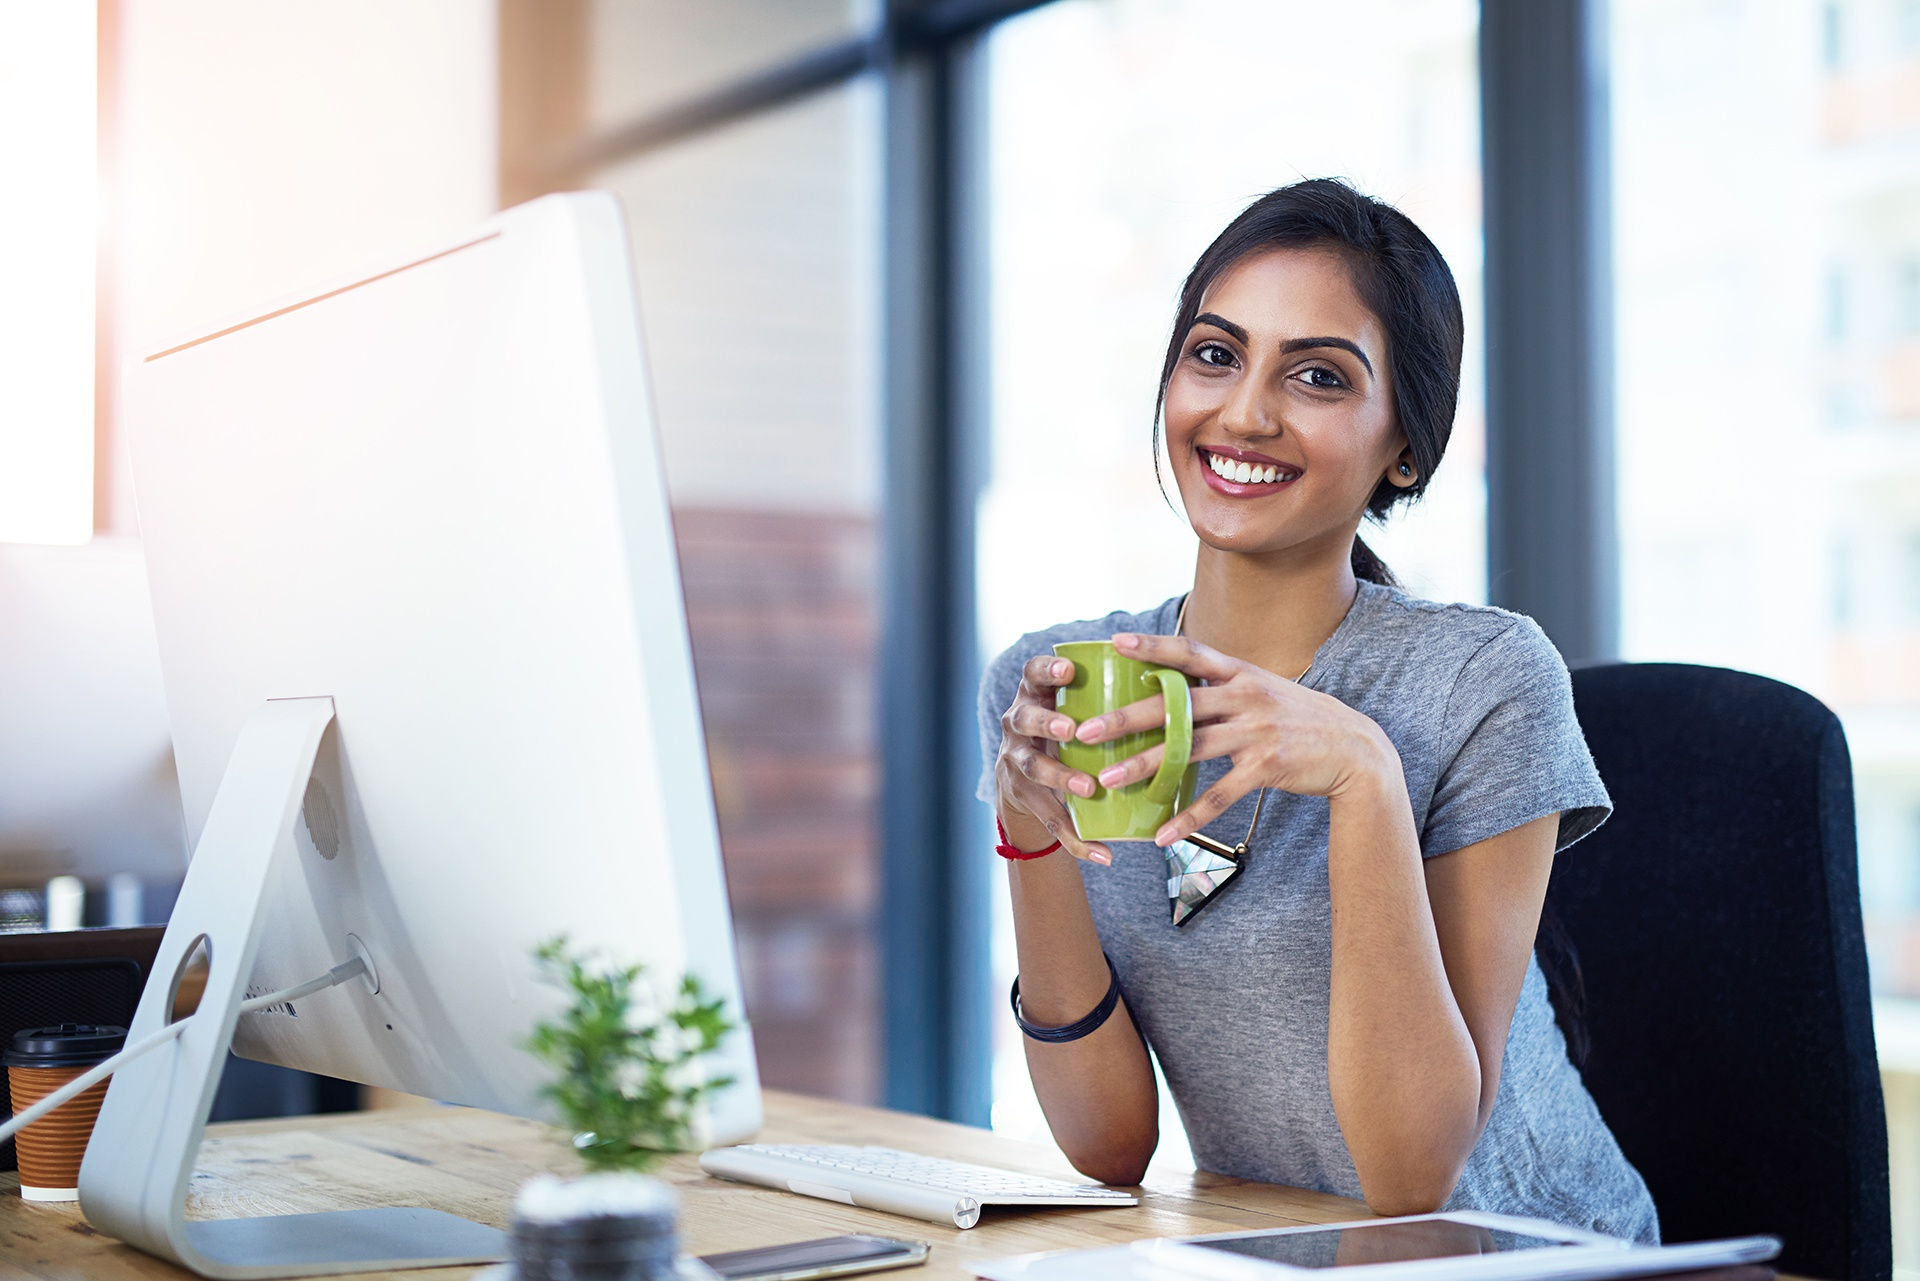 Stock_People_Woman_Working_Computer4_Website_1920x1280.jpg